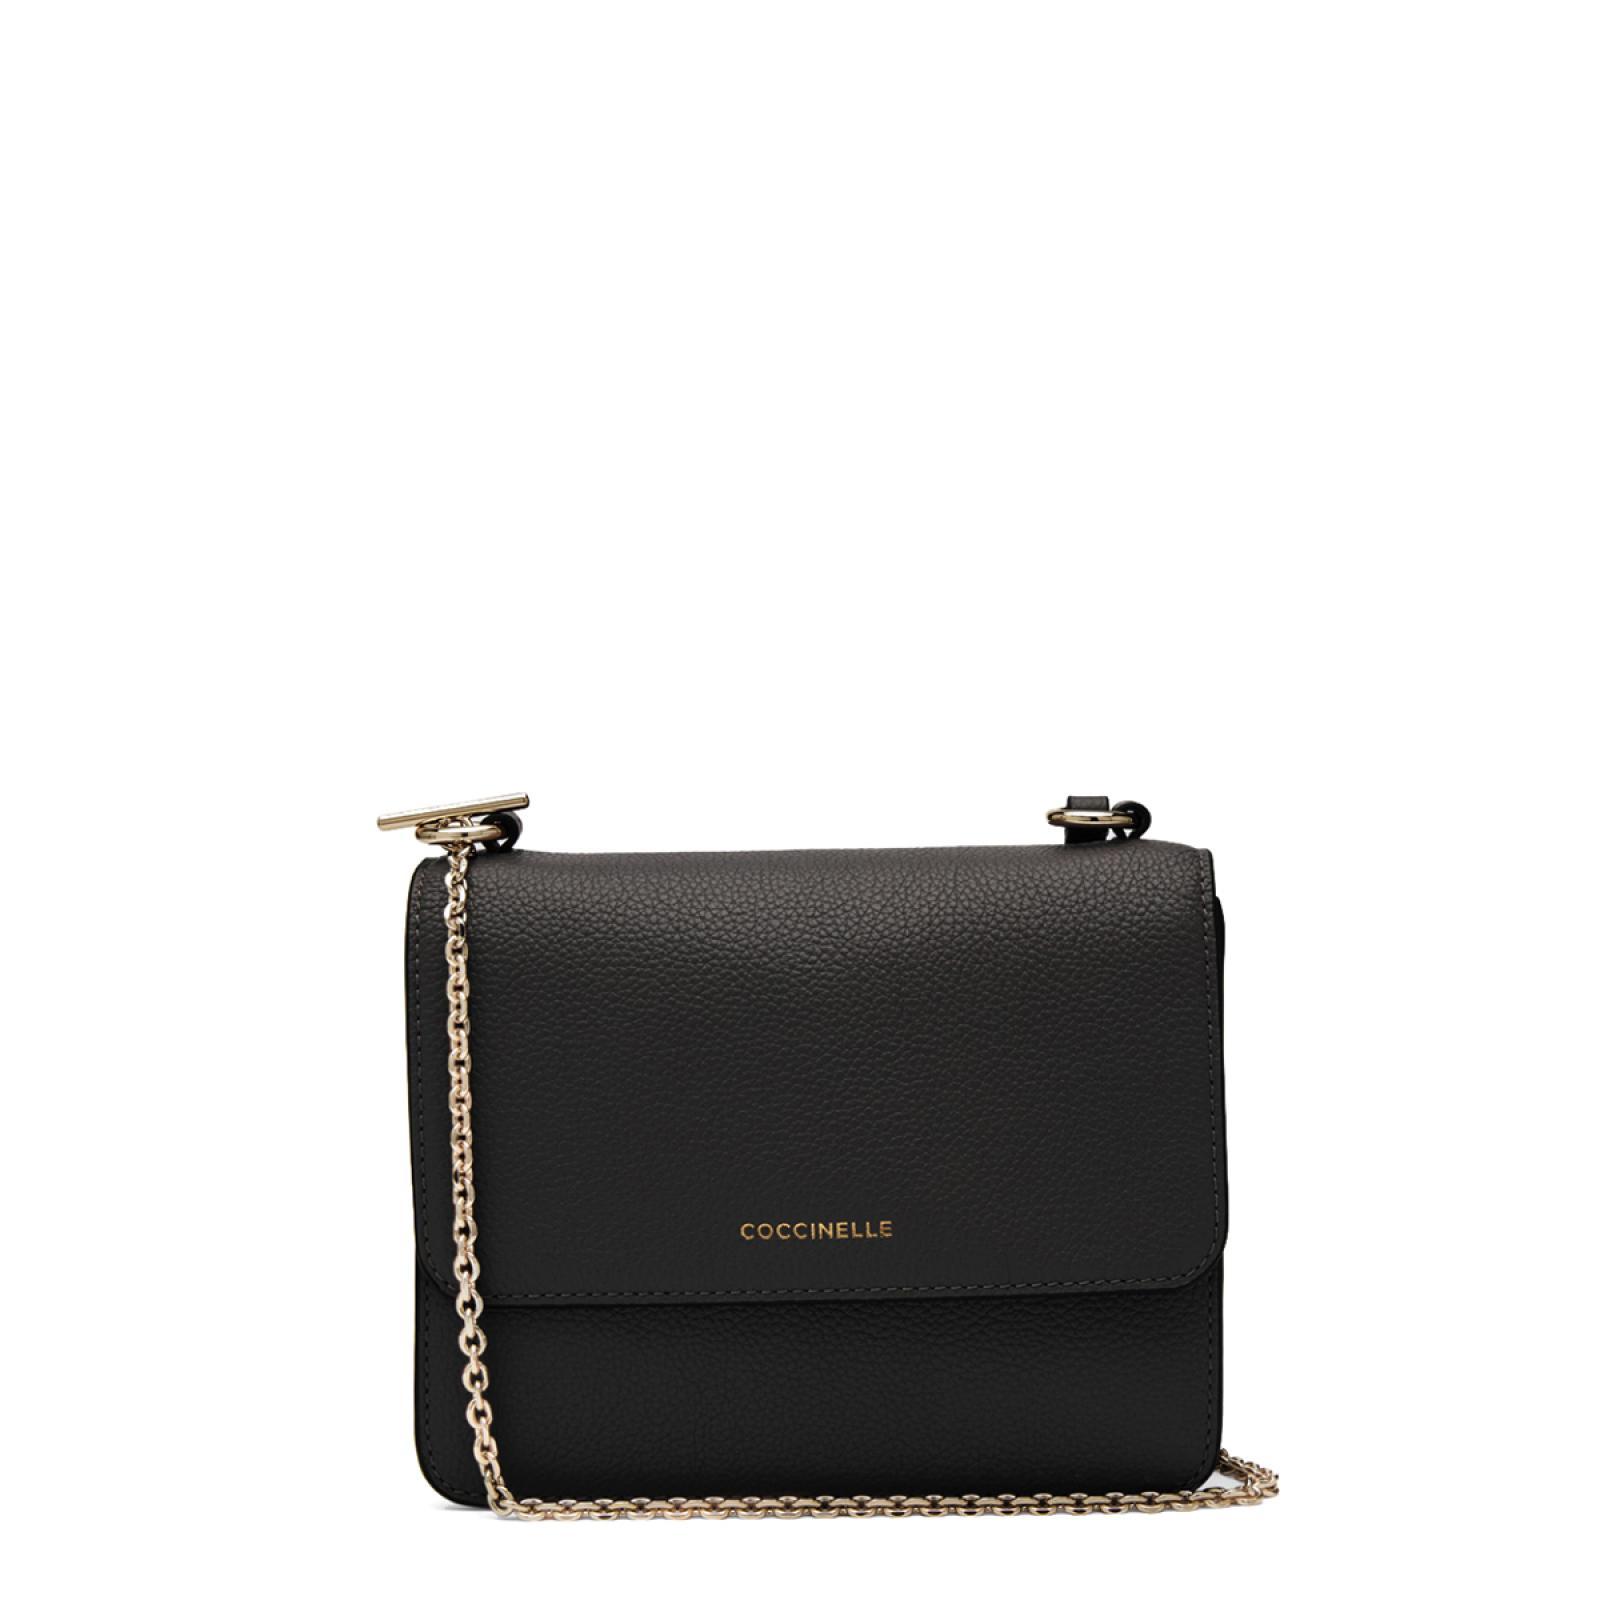 Coccinelle Minibag Anne - 1